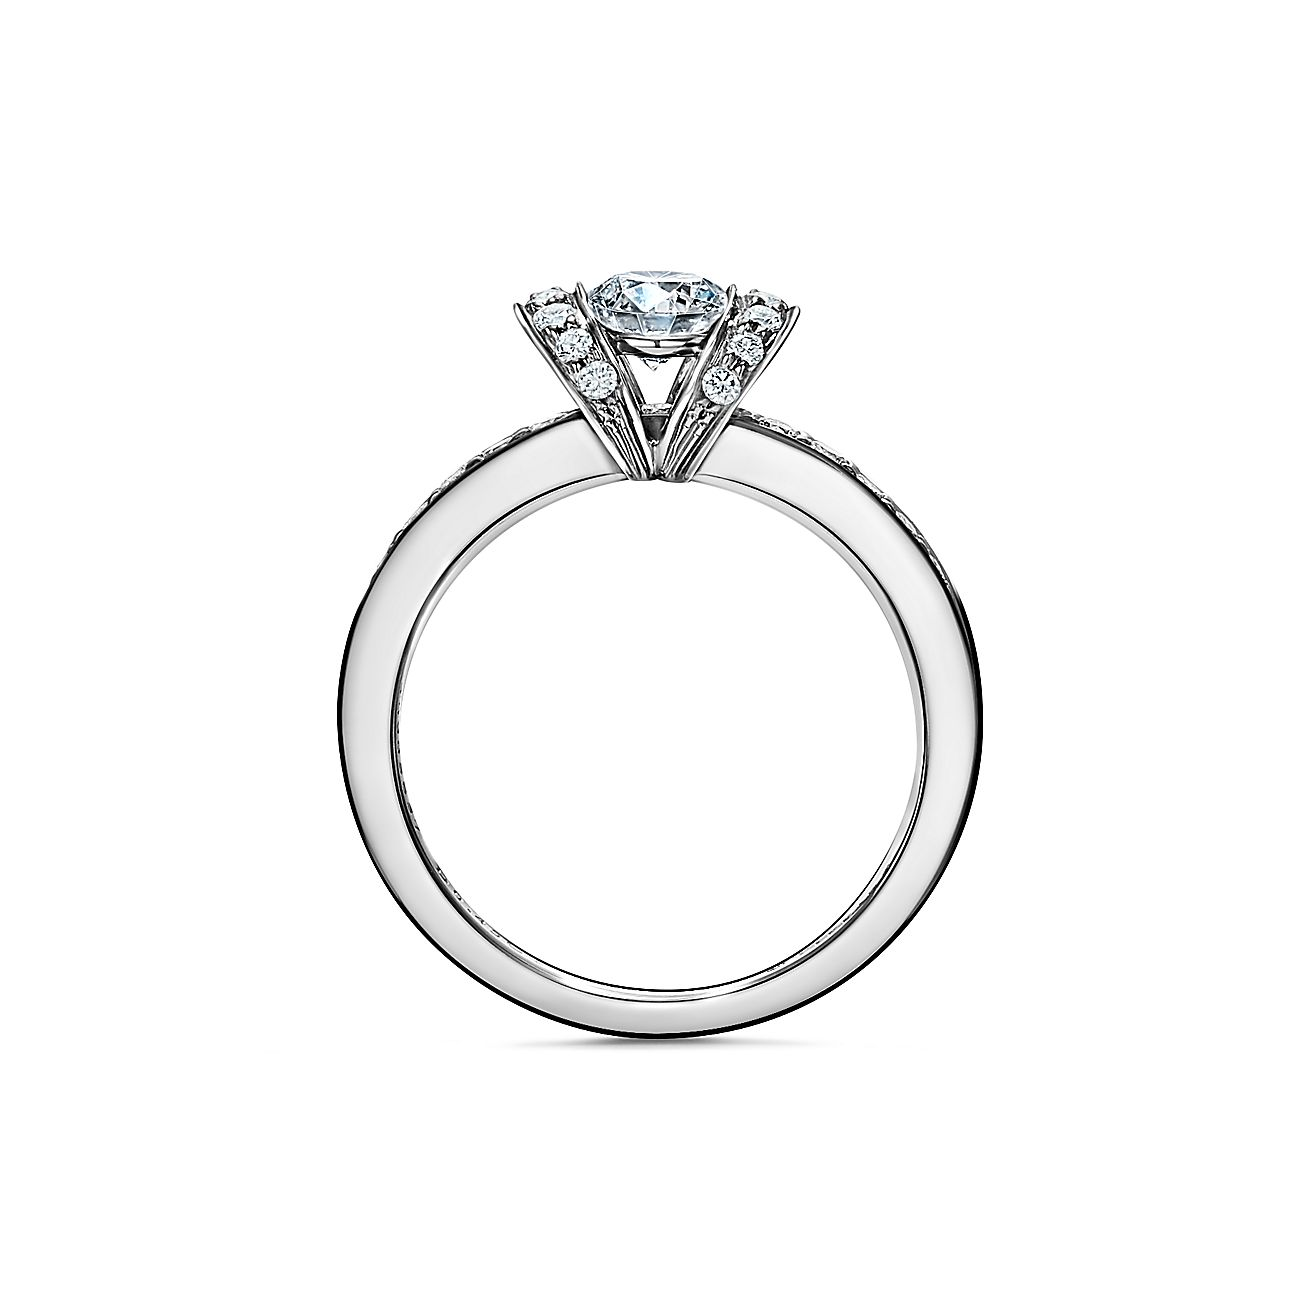 Tiffany Ribbon Engagement Ring In Platinum Tiffany Co